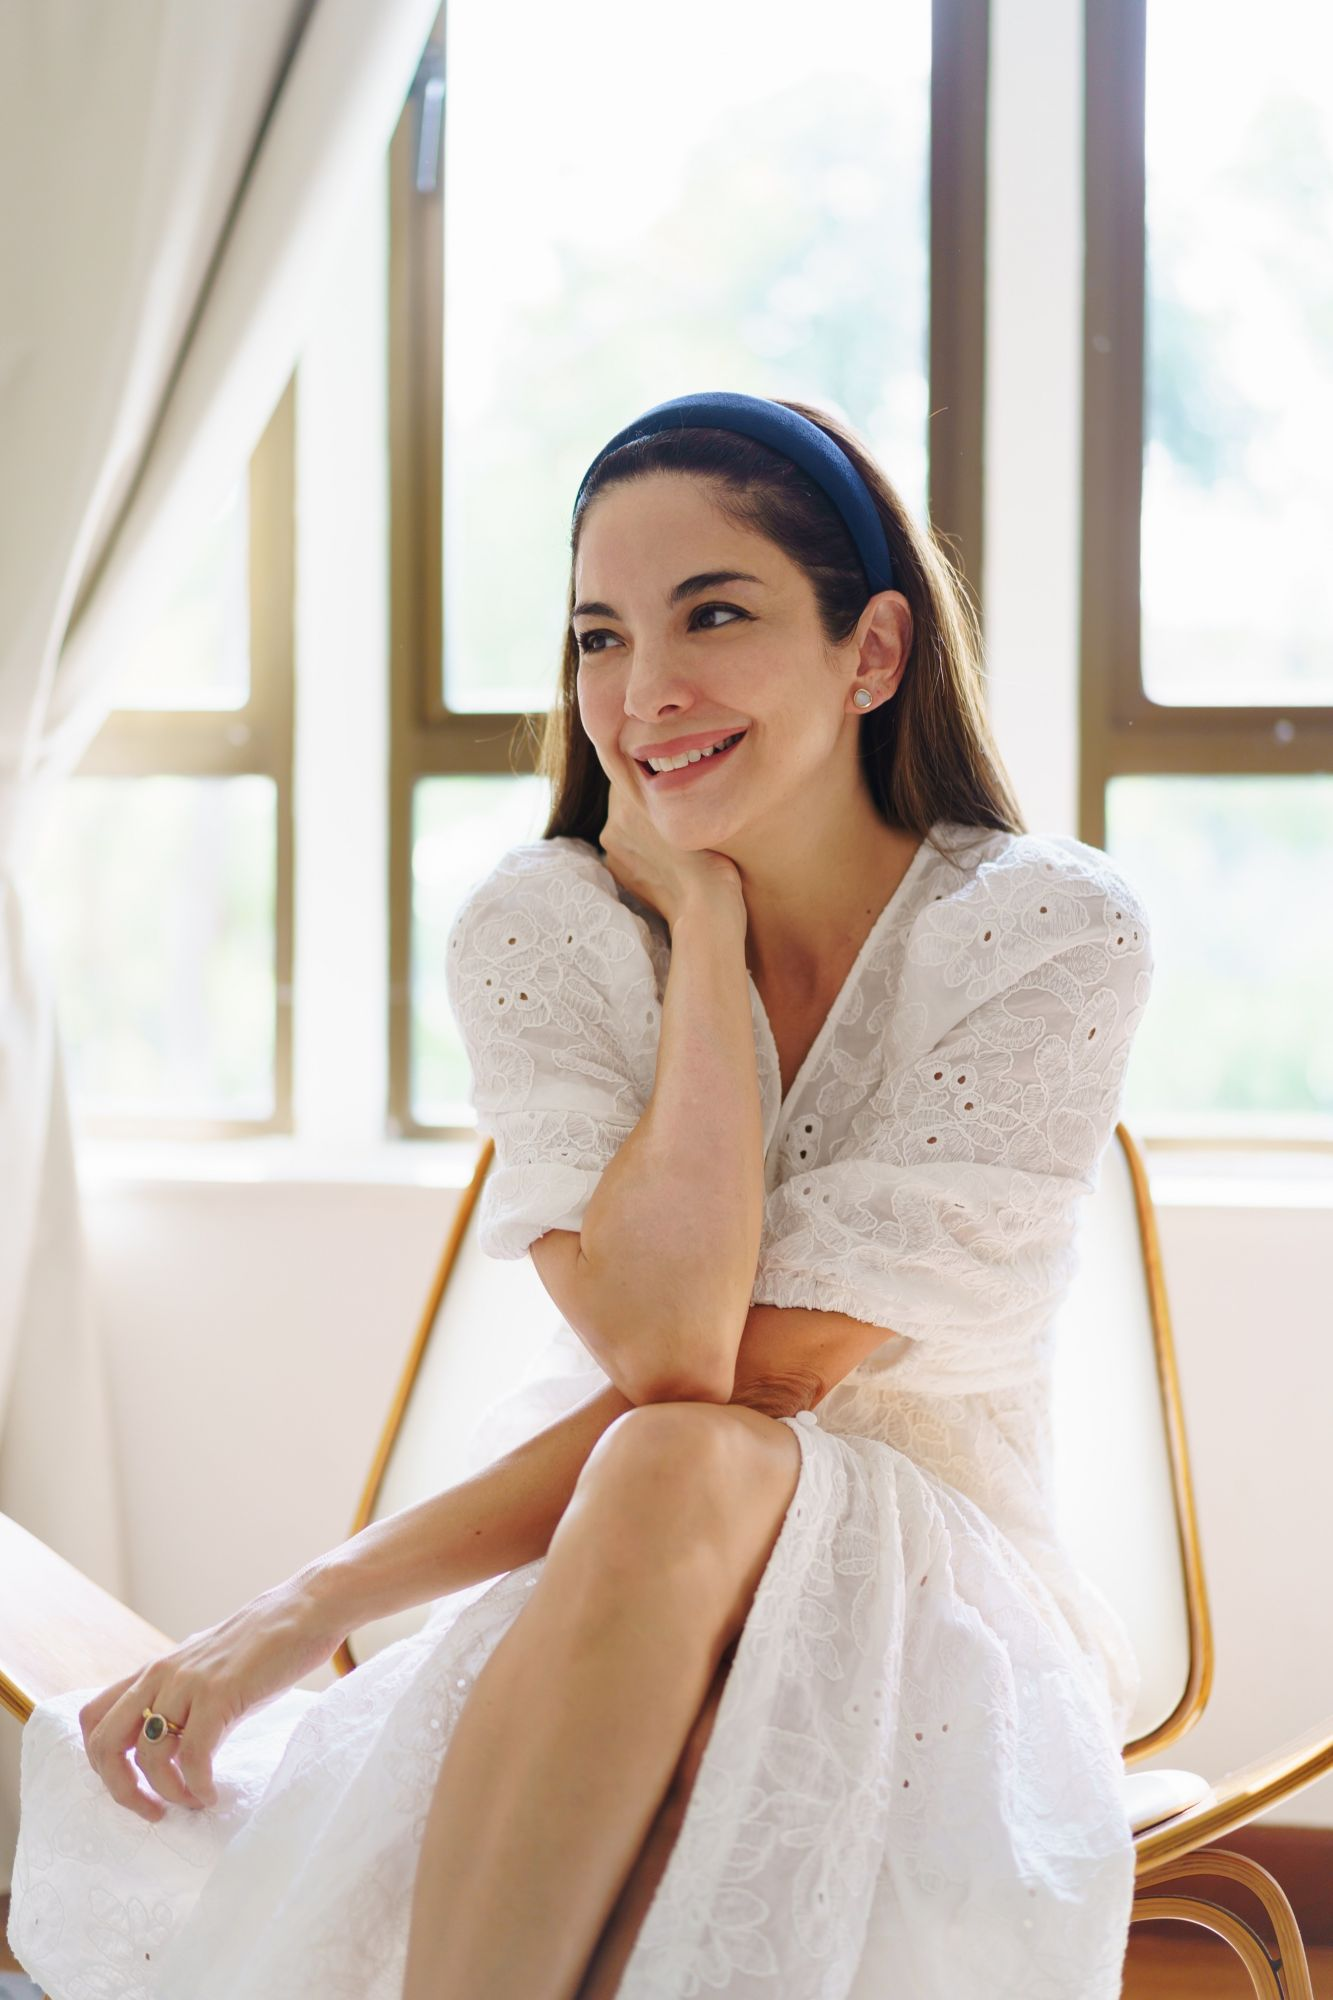 Amanda Griffin Jacob Shares Her Evening Skincare Routine